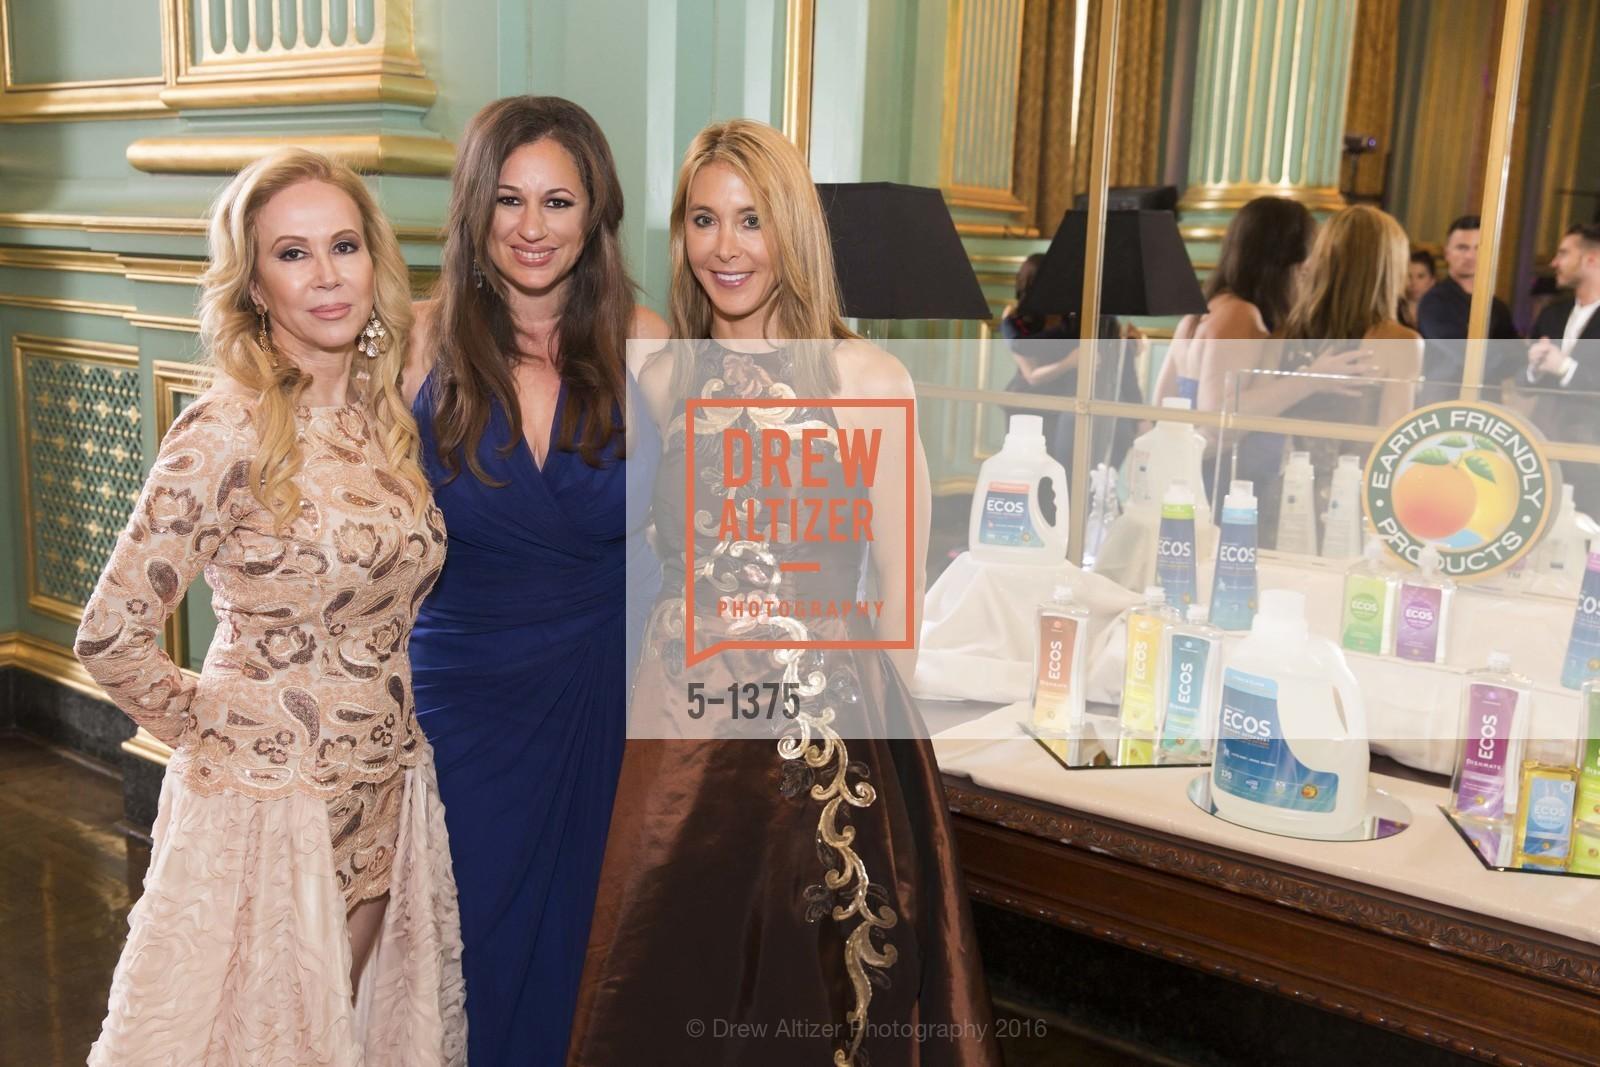 Sophie Azouaou, Kelley Vlahakis-Hanks, Eileen Blum-Bourgade, Photo #5-1375